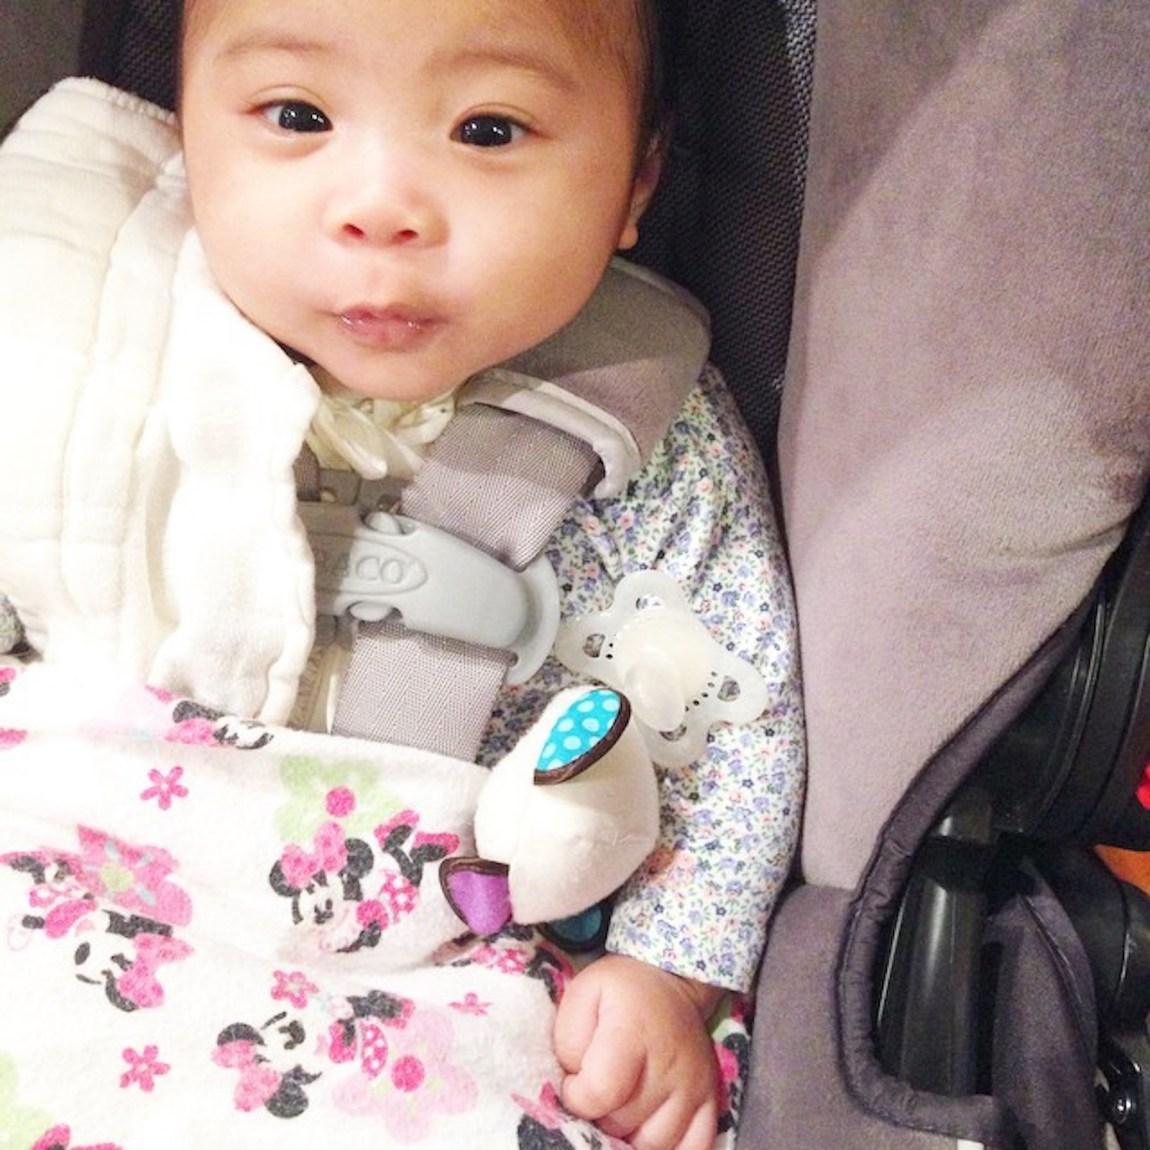 Met up with this cutie patootie 😍 #myniece #goddaughter #lemmetakeasophie